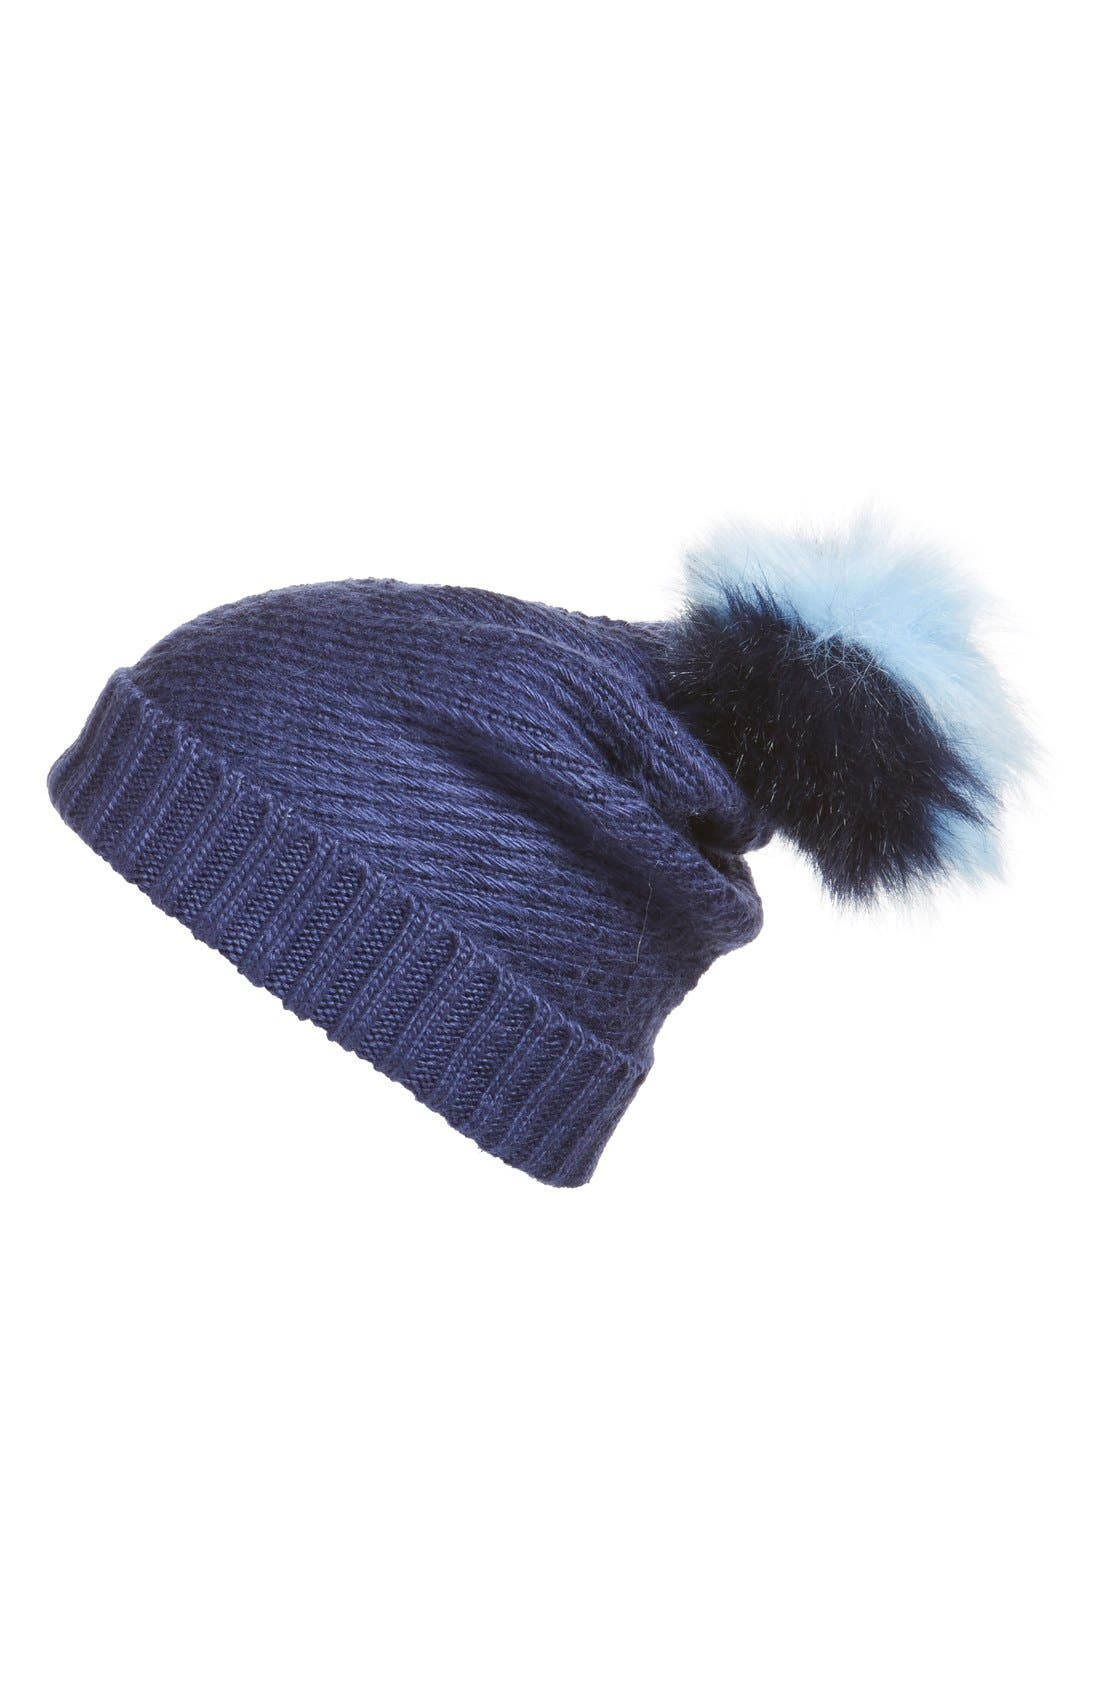 Alternate Image 1 Selected - BCBG Faux Fur Pompom Knit Beanie